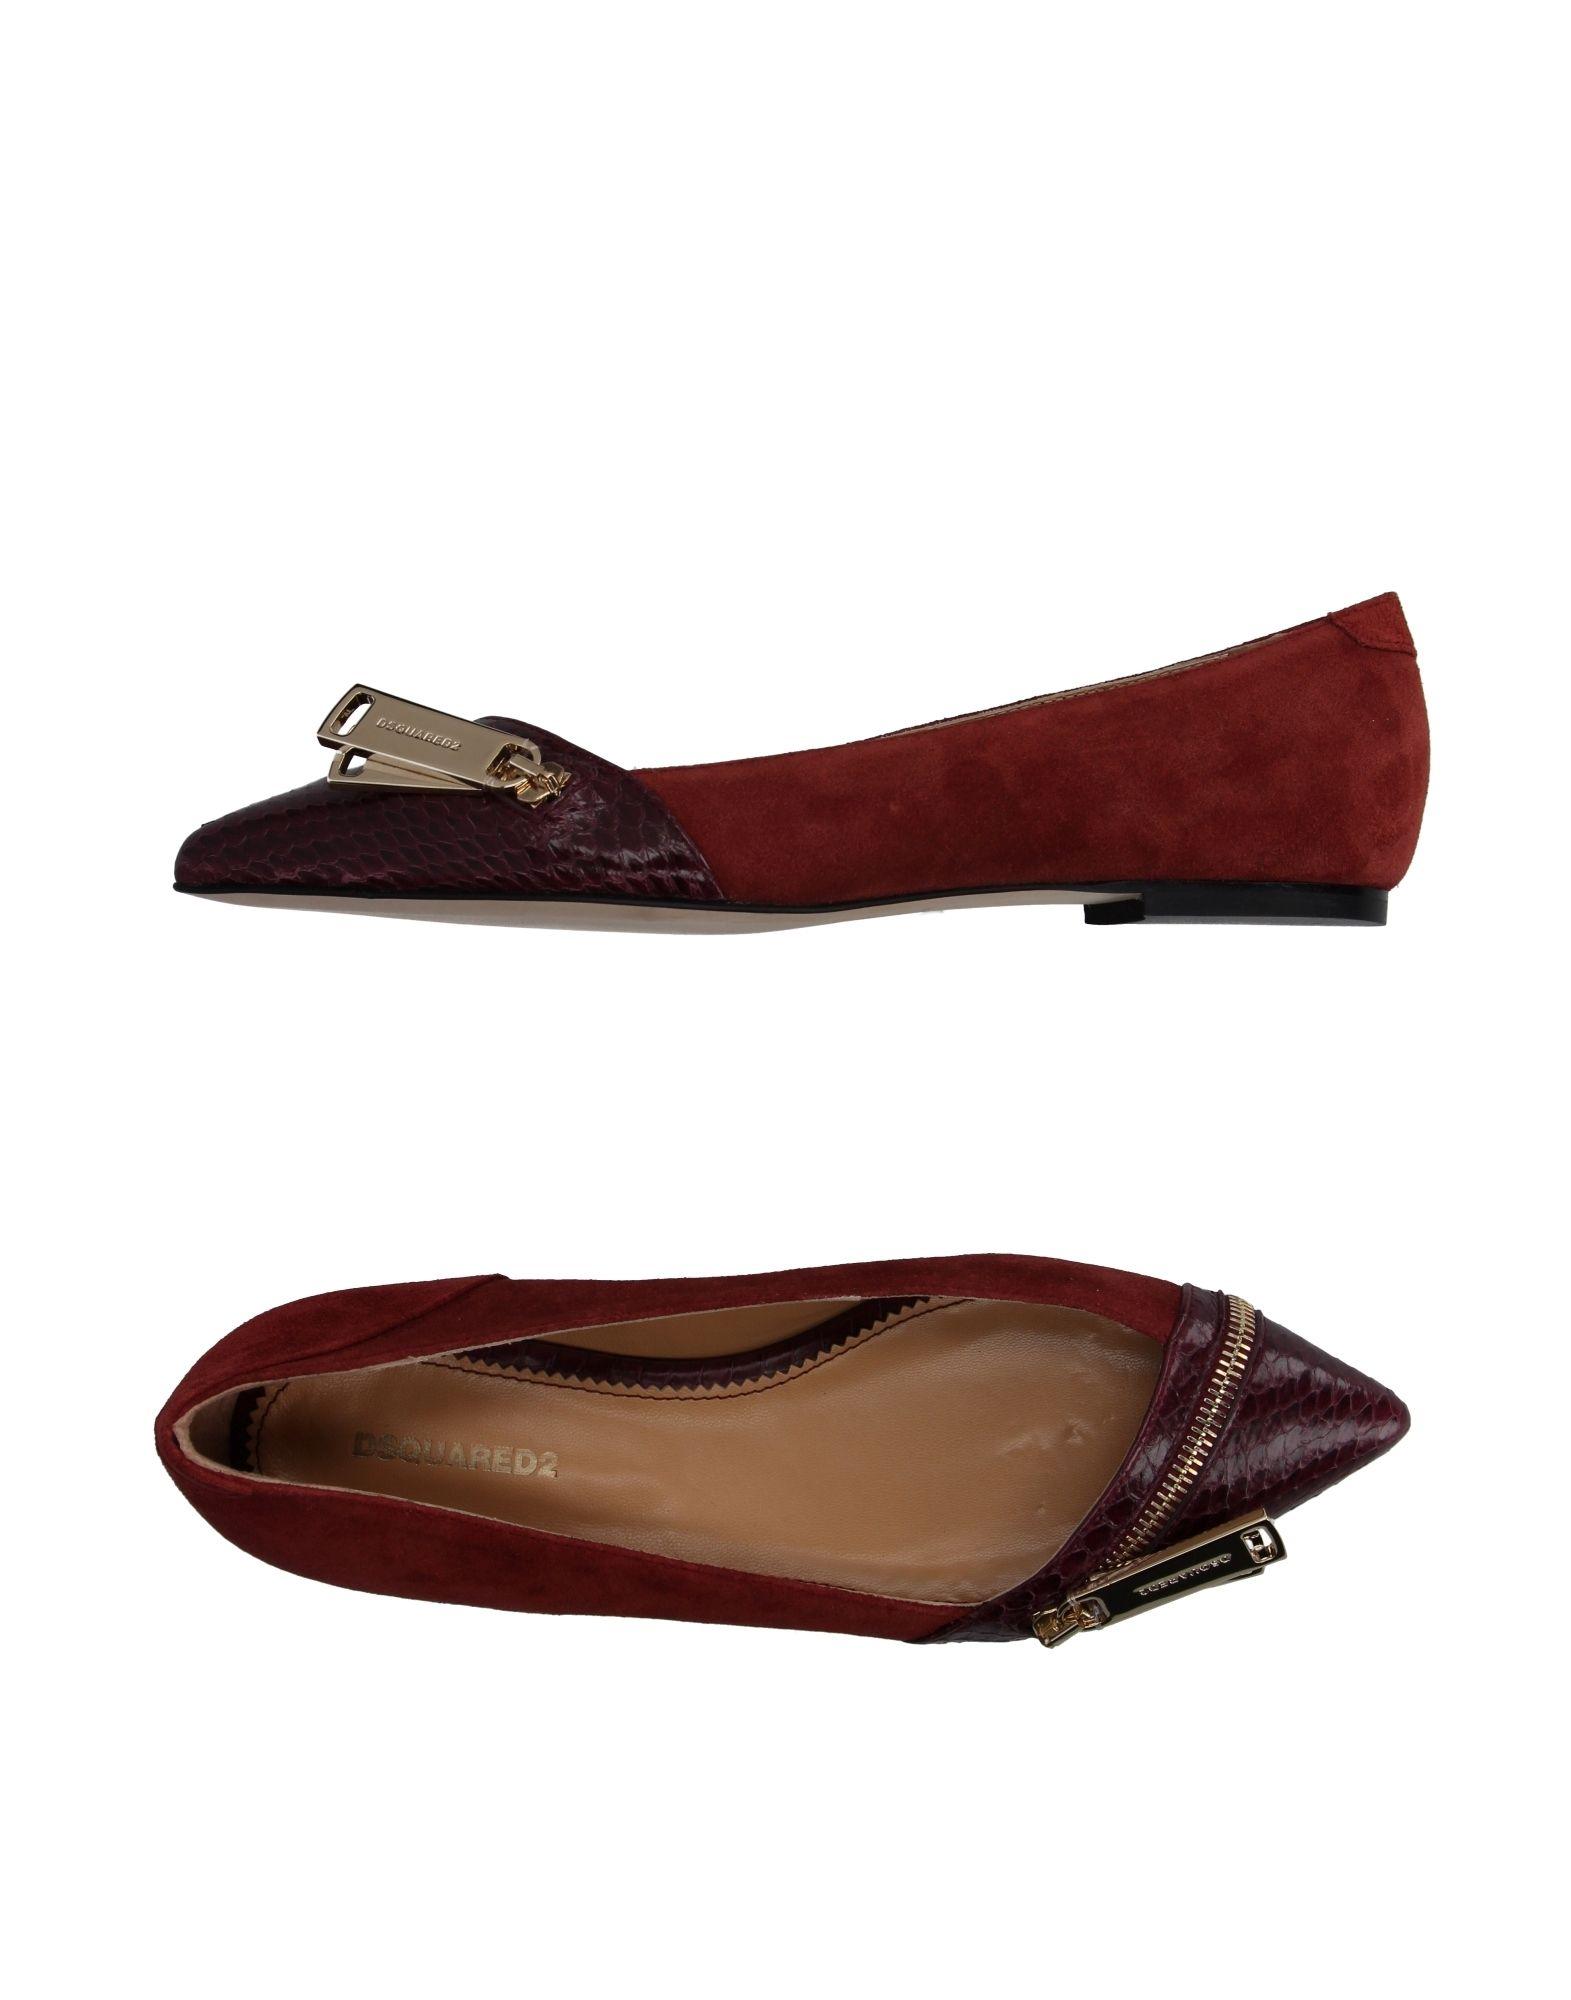 Stilvolle billige Schuhe DsquaROT2 Ballerinas Damen  11067333OW 11067333OW 11067333OW 97fe41